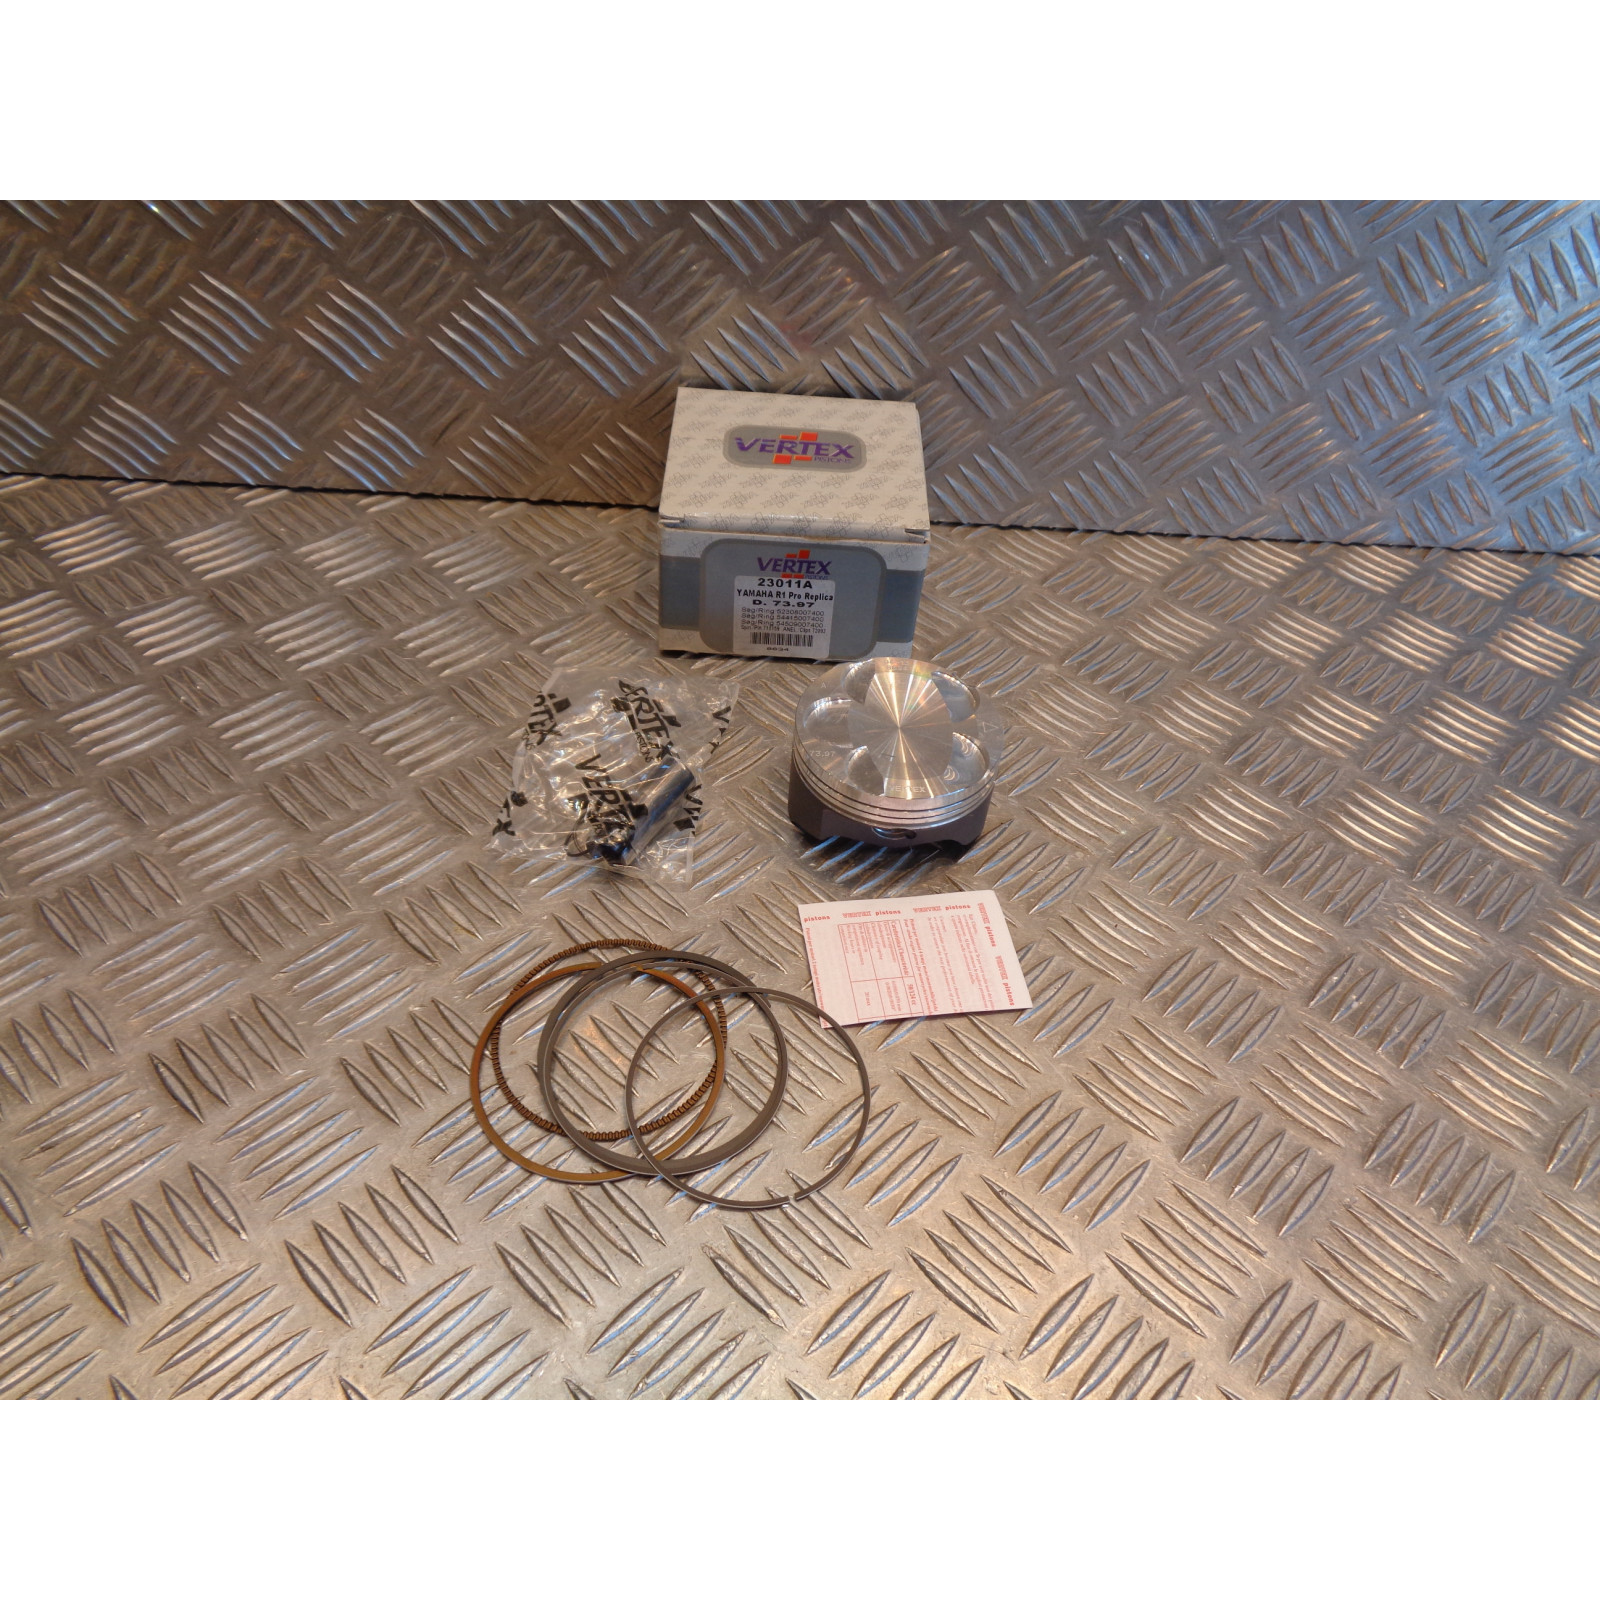 piston vertex 73,97 mm moto yamaha 1000 yzf r1 pro replica 23011A bihr 9454DA fx140 2003 - 05